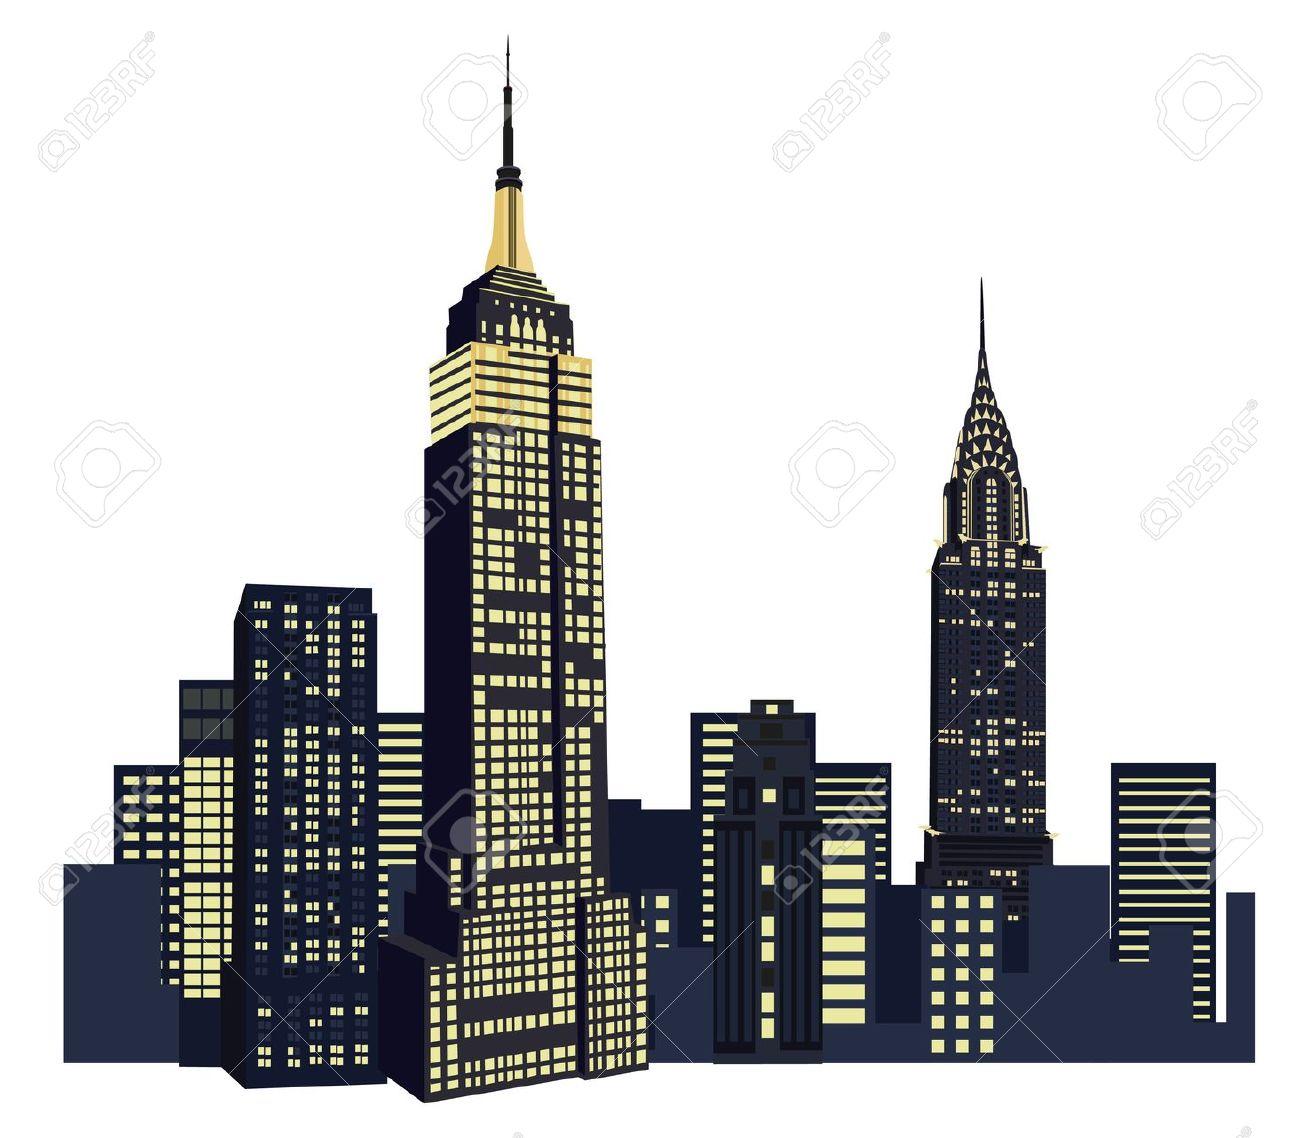 New York City Clipart - ClipartFest-New york city clipart - ClipartFest-6